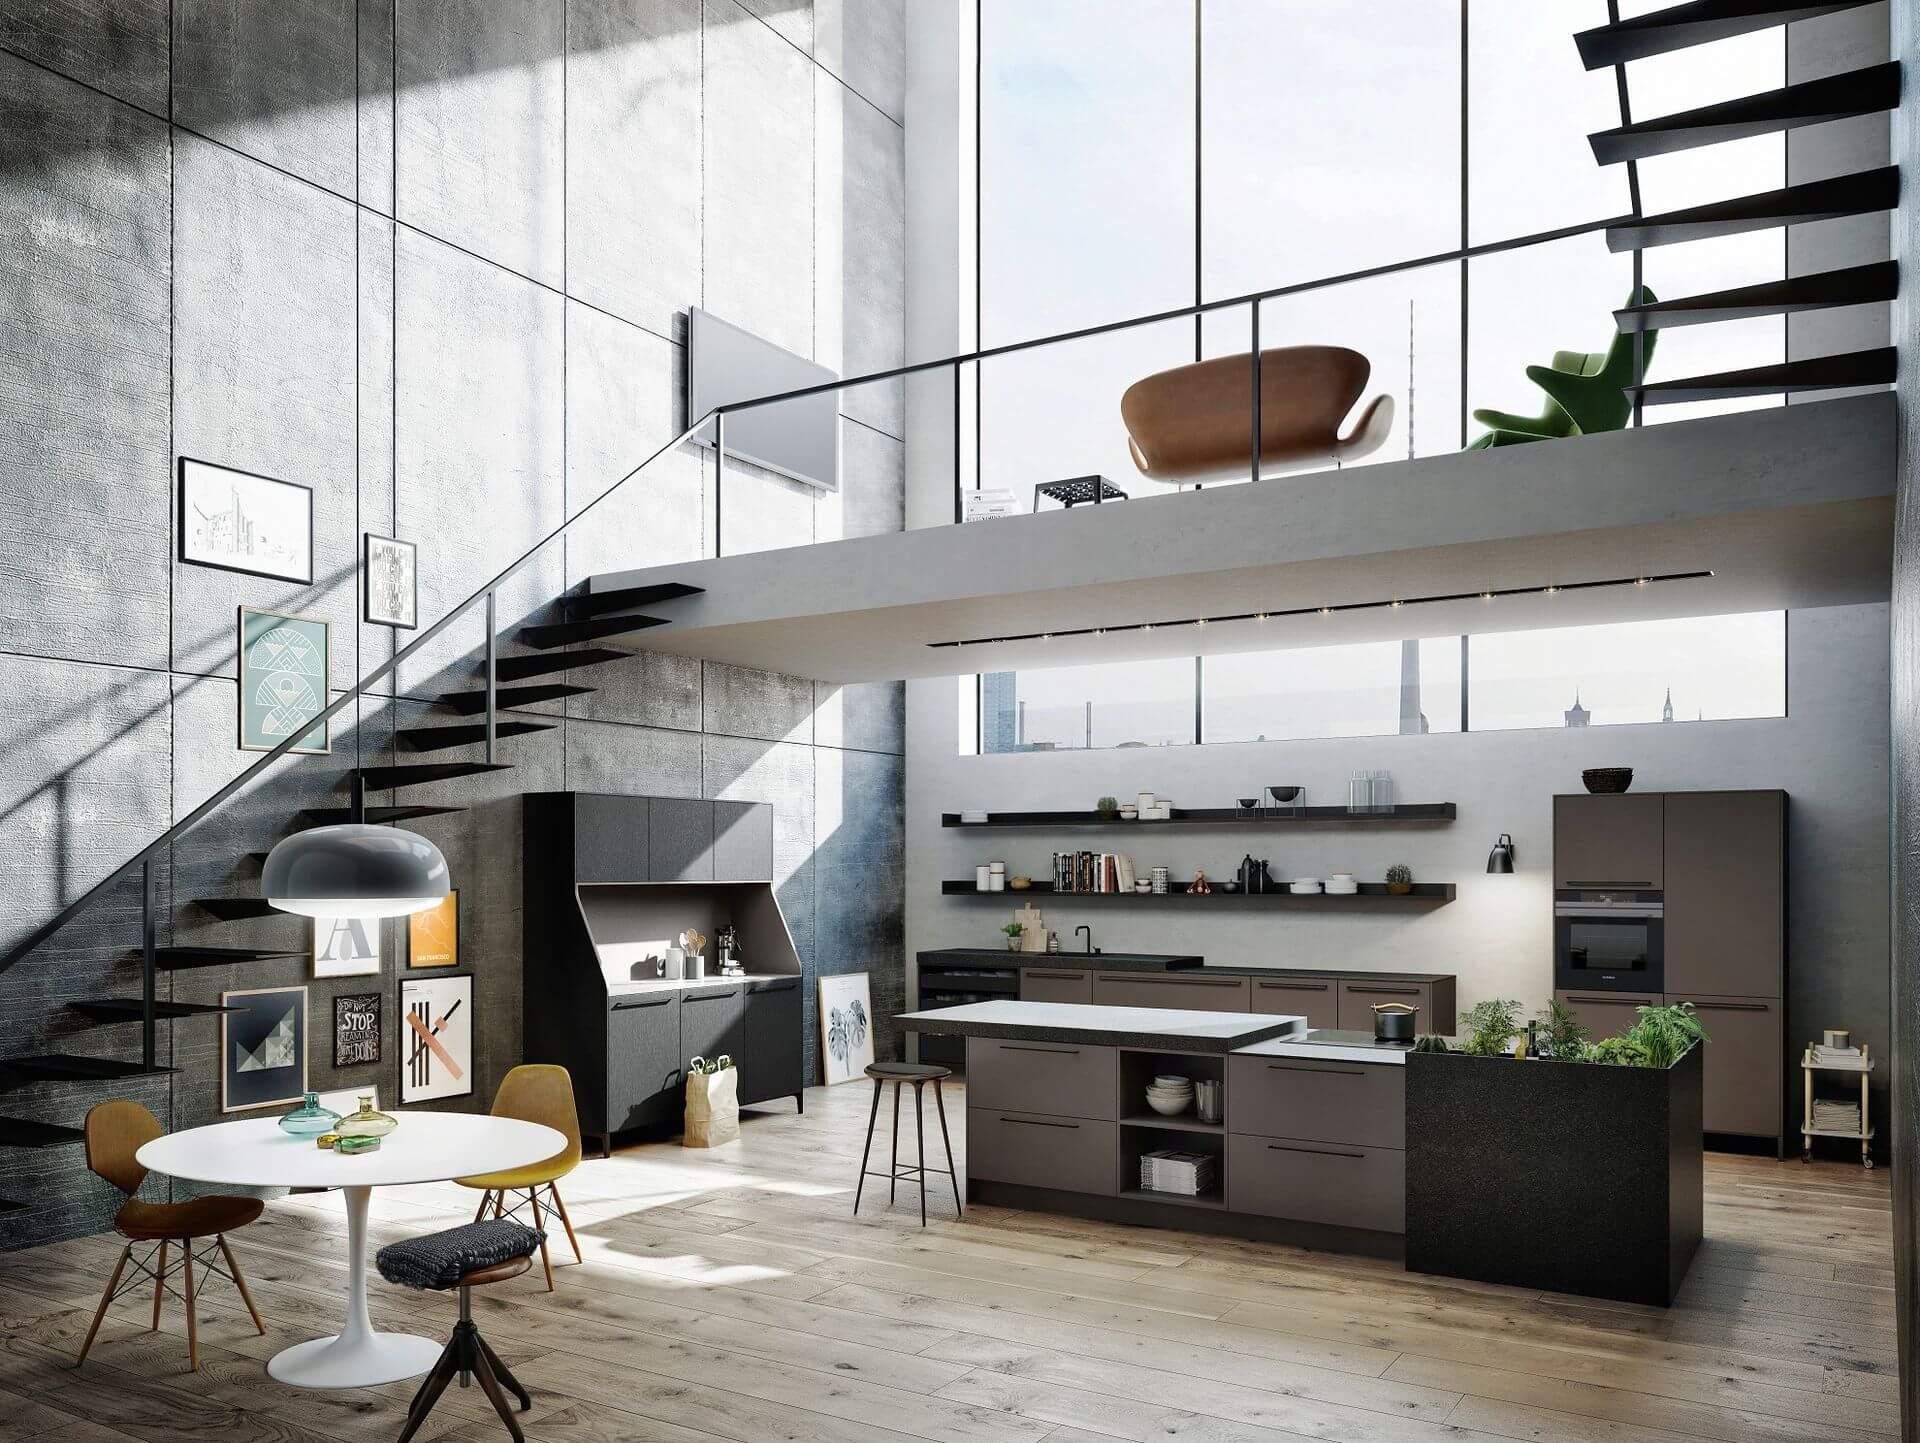 30 Modern German Interior Design Styles Are Here The Architecture Designs